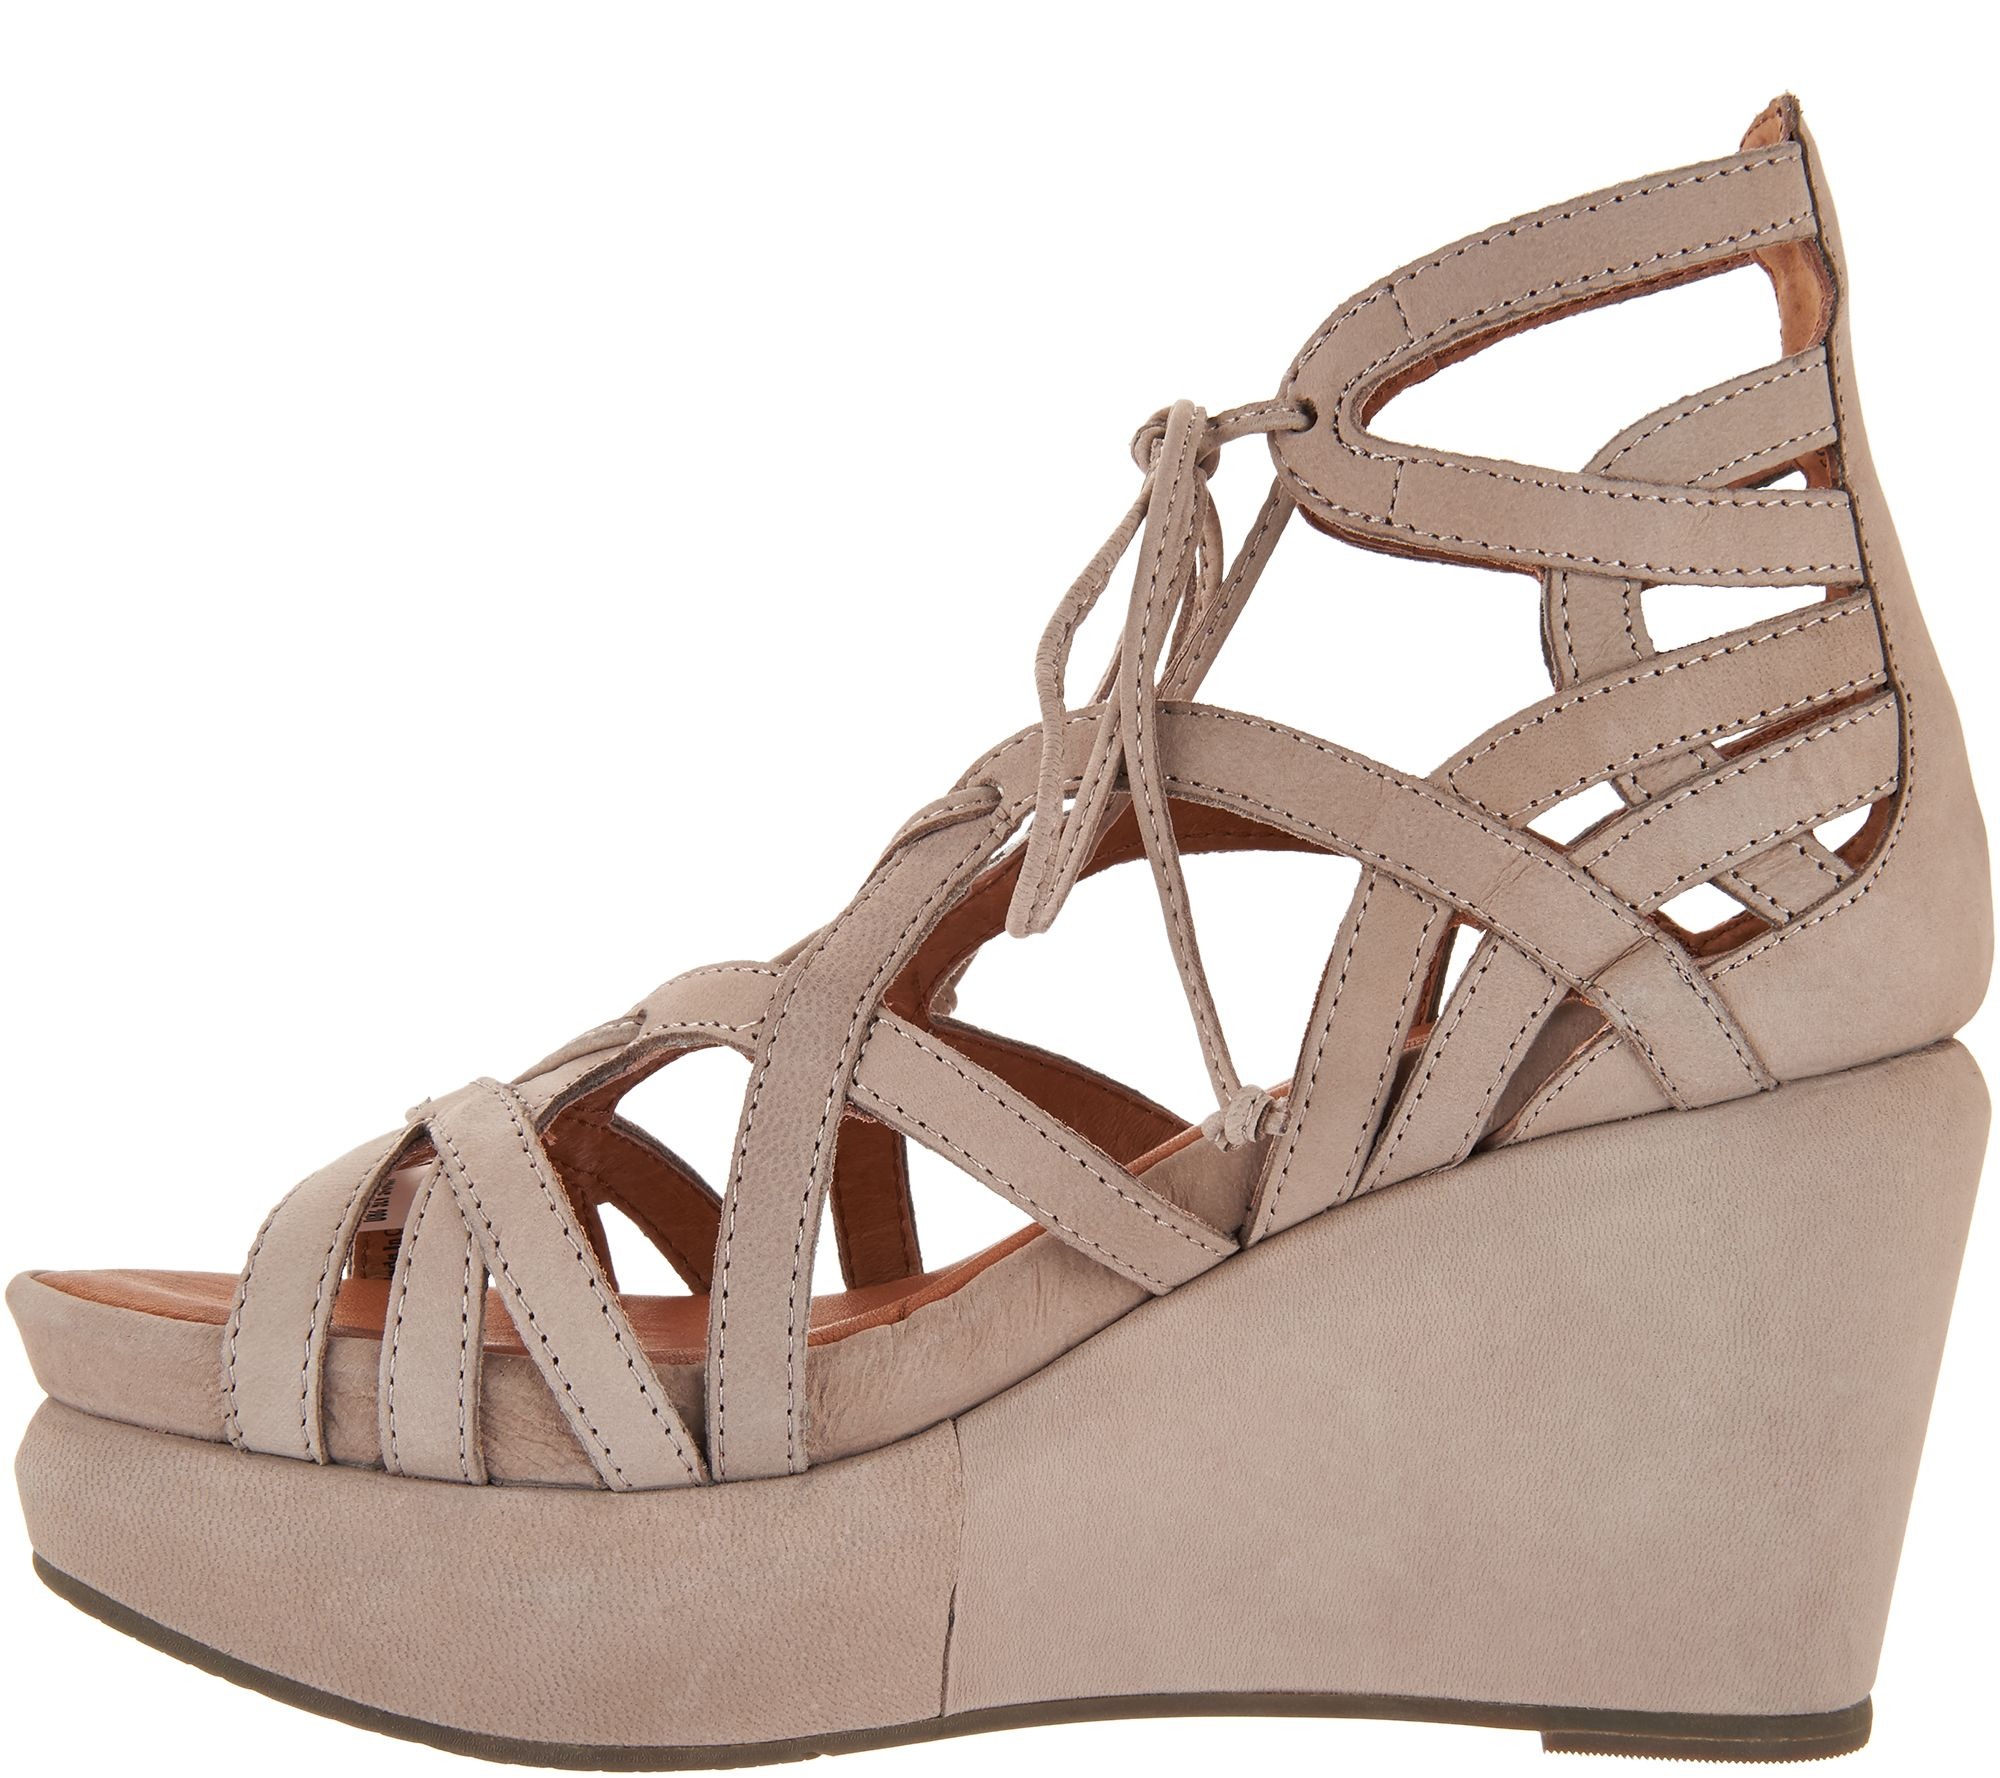 9c61cd6e9b77b5 Gentle Souls Leather Lace-up Wedge Sandals - Joy - Page 1 — QVC.com